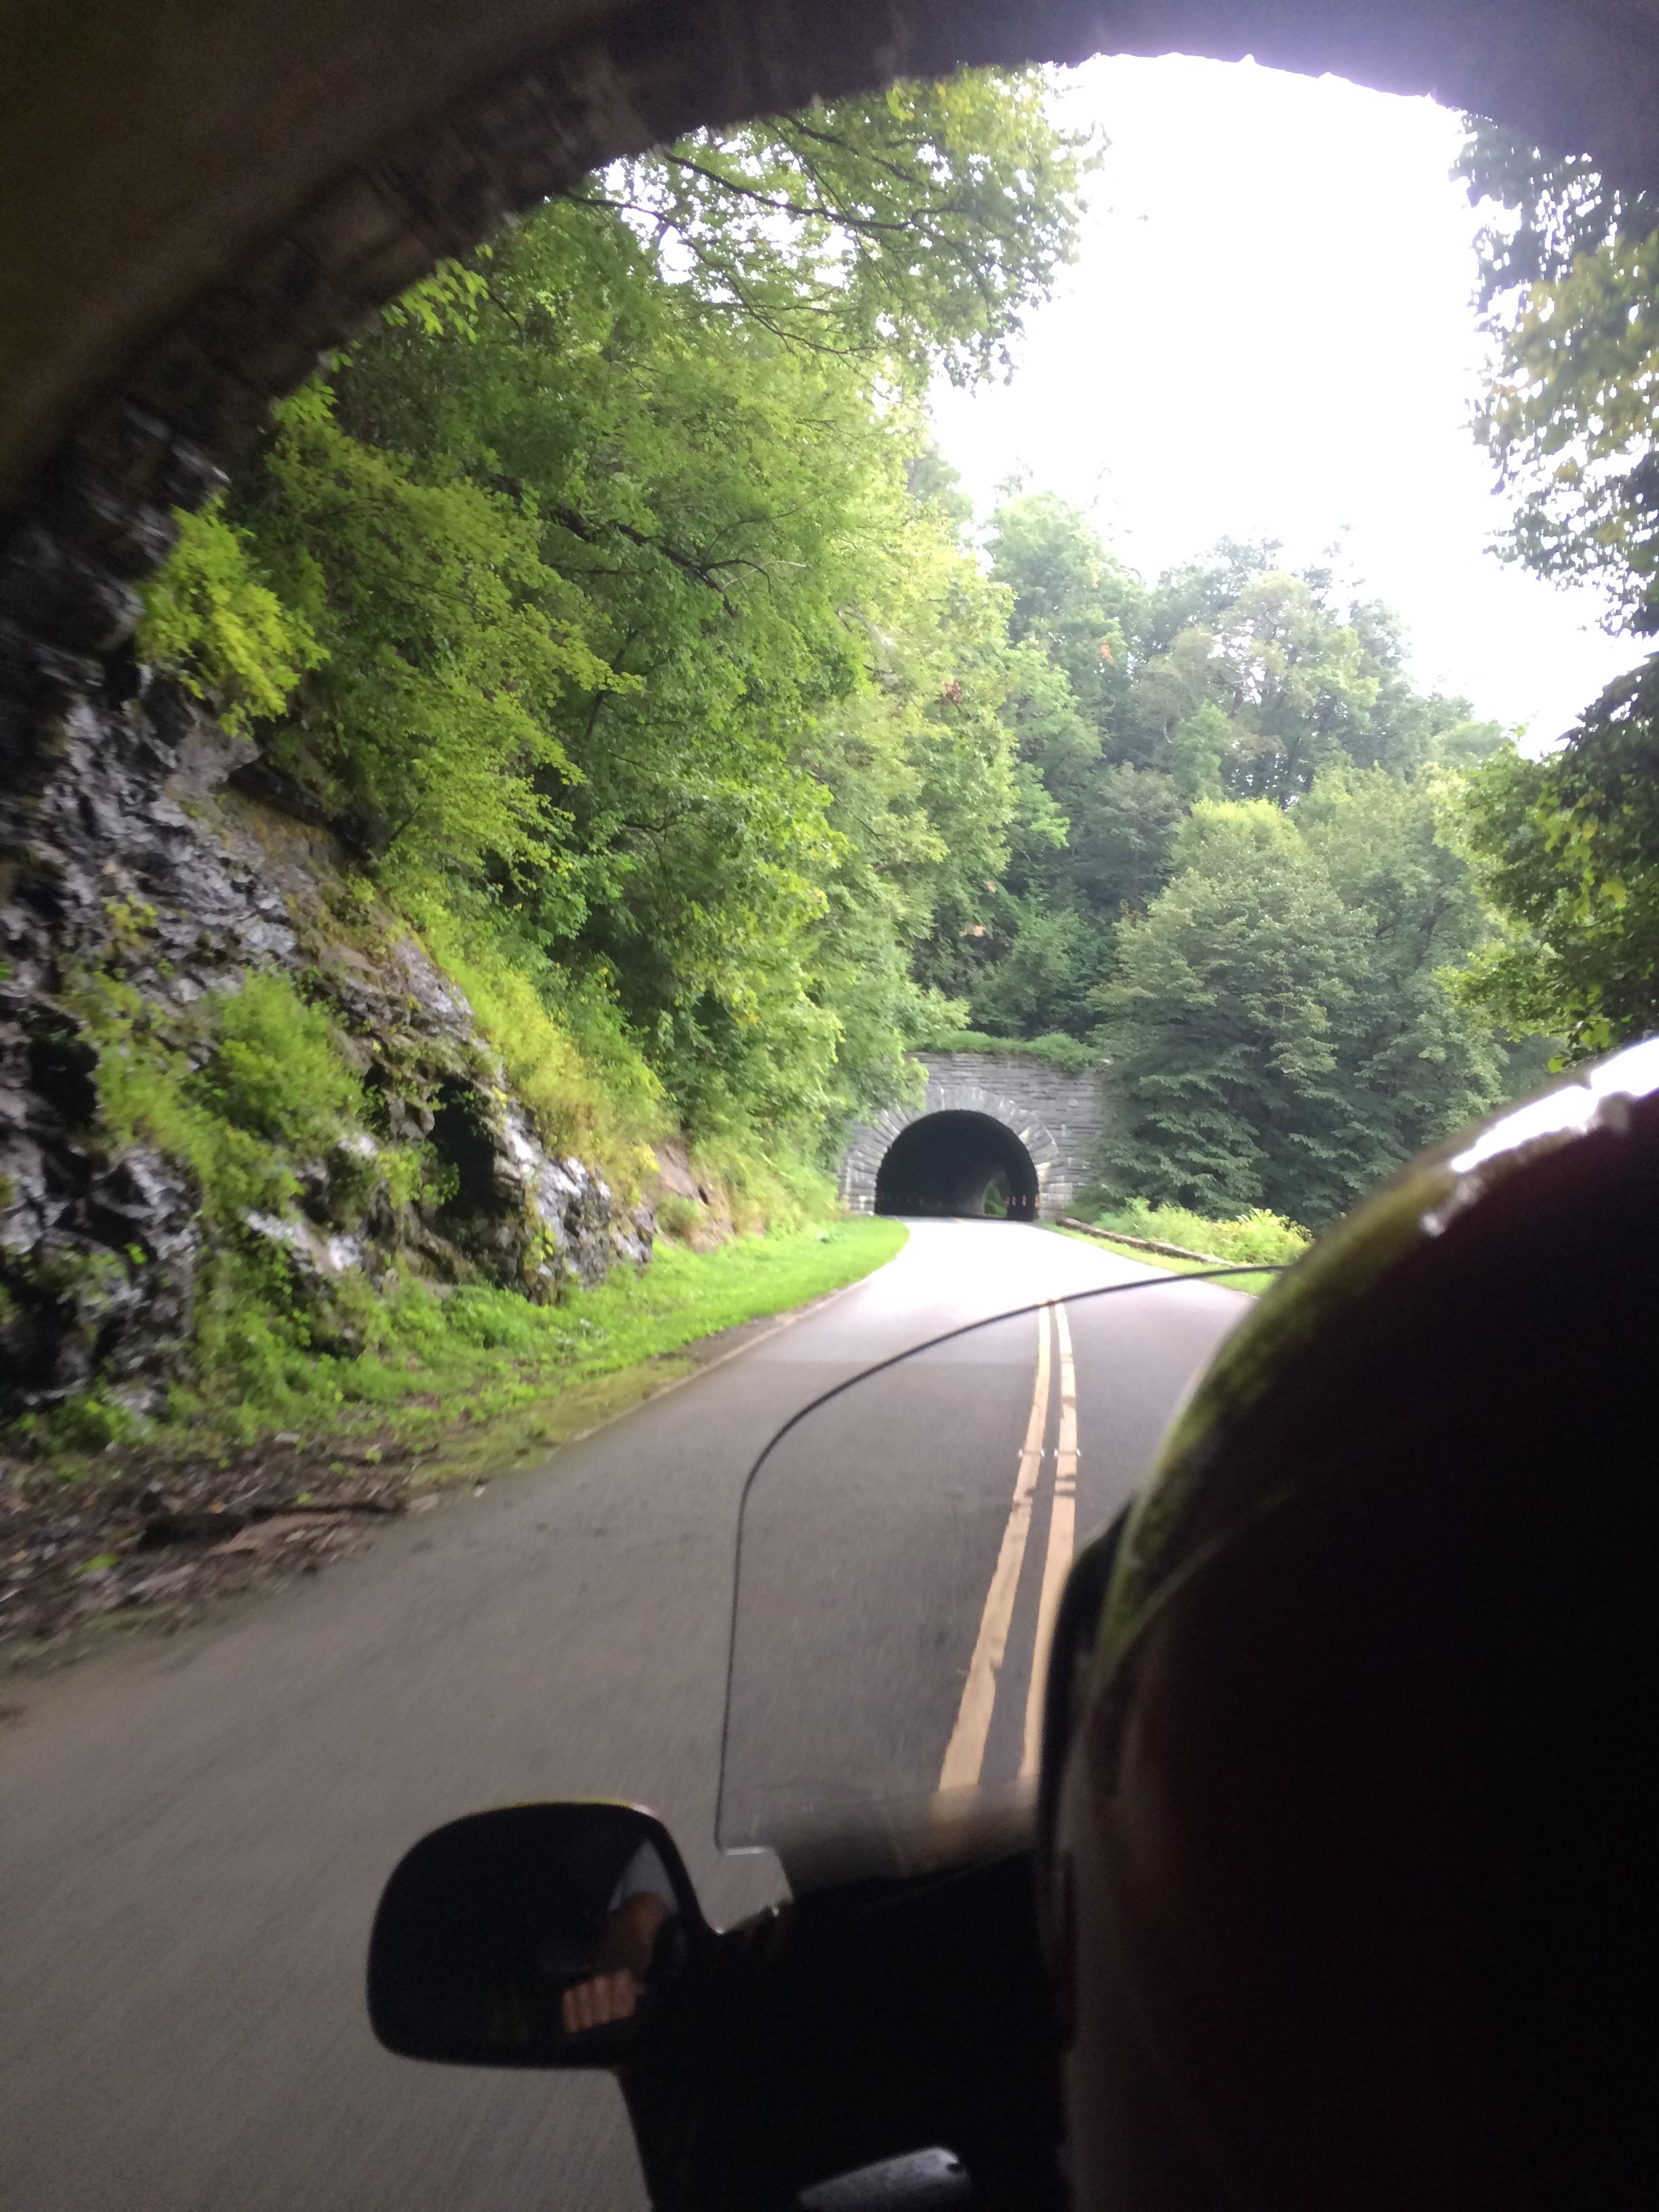 Twin tunnels